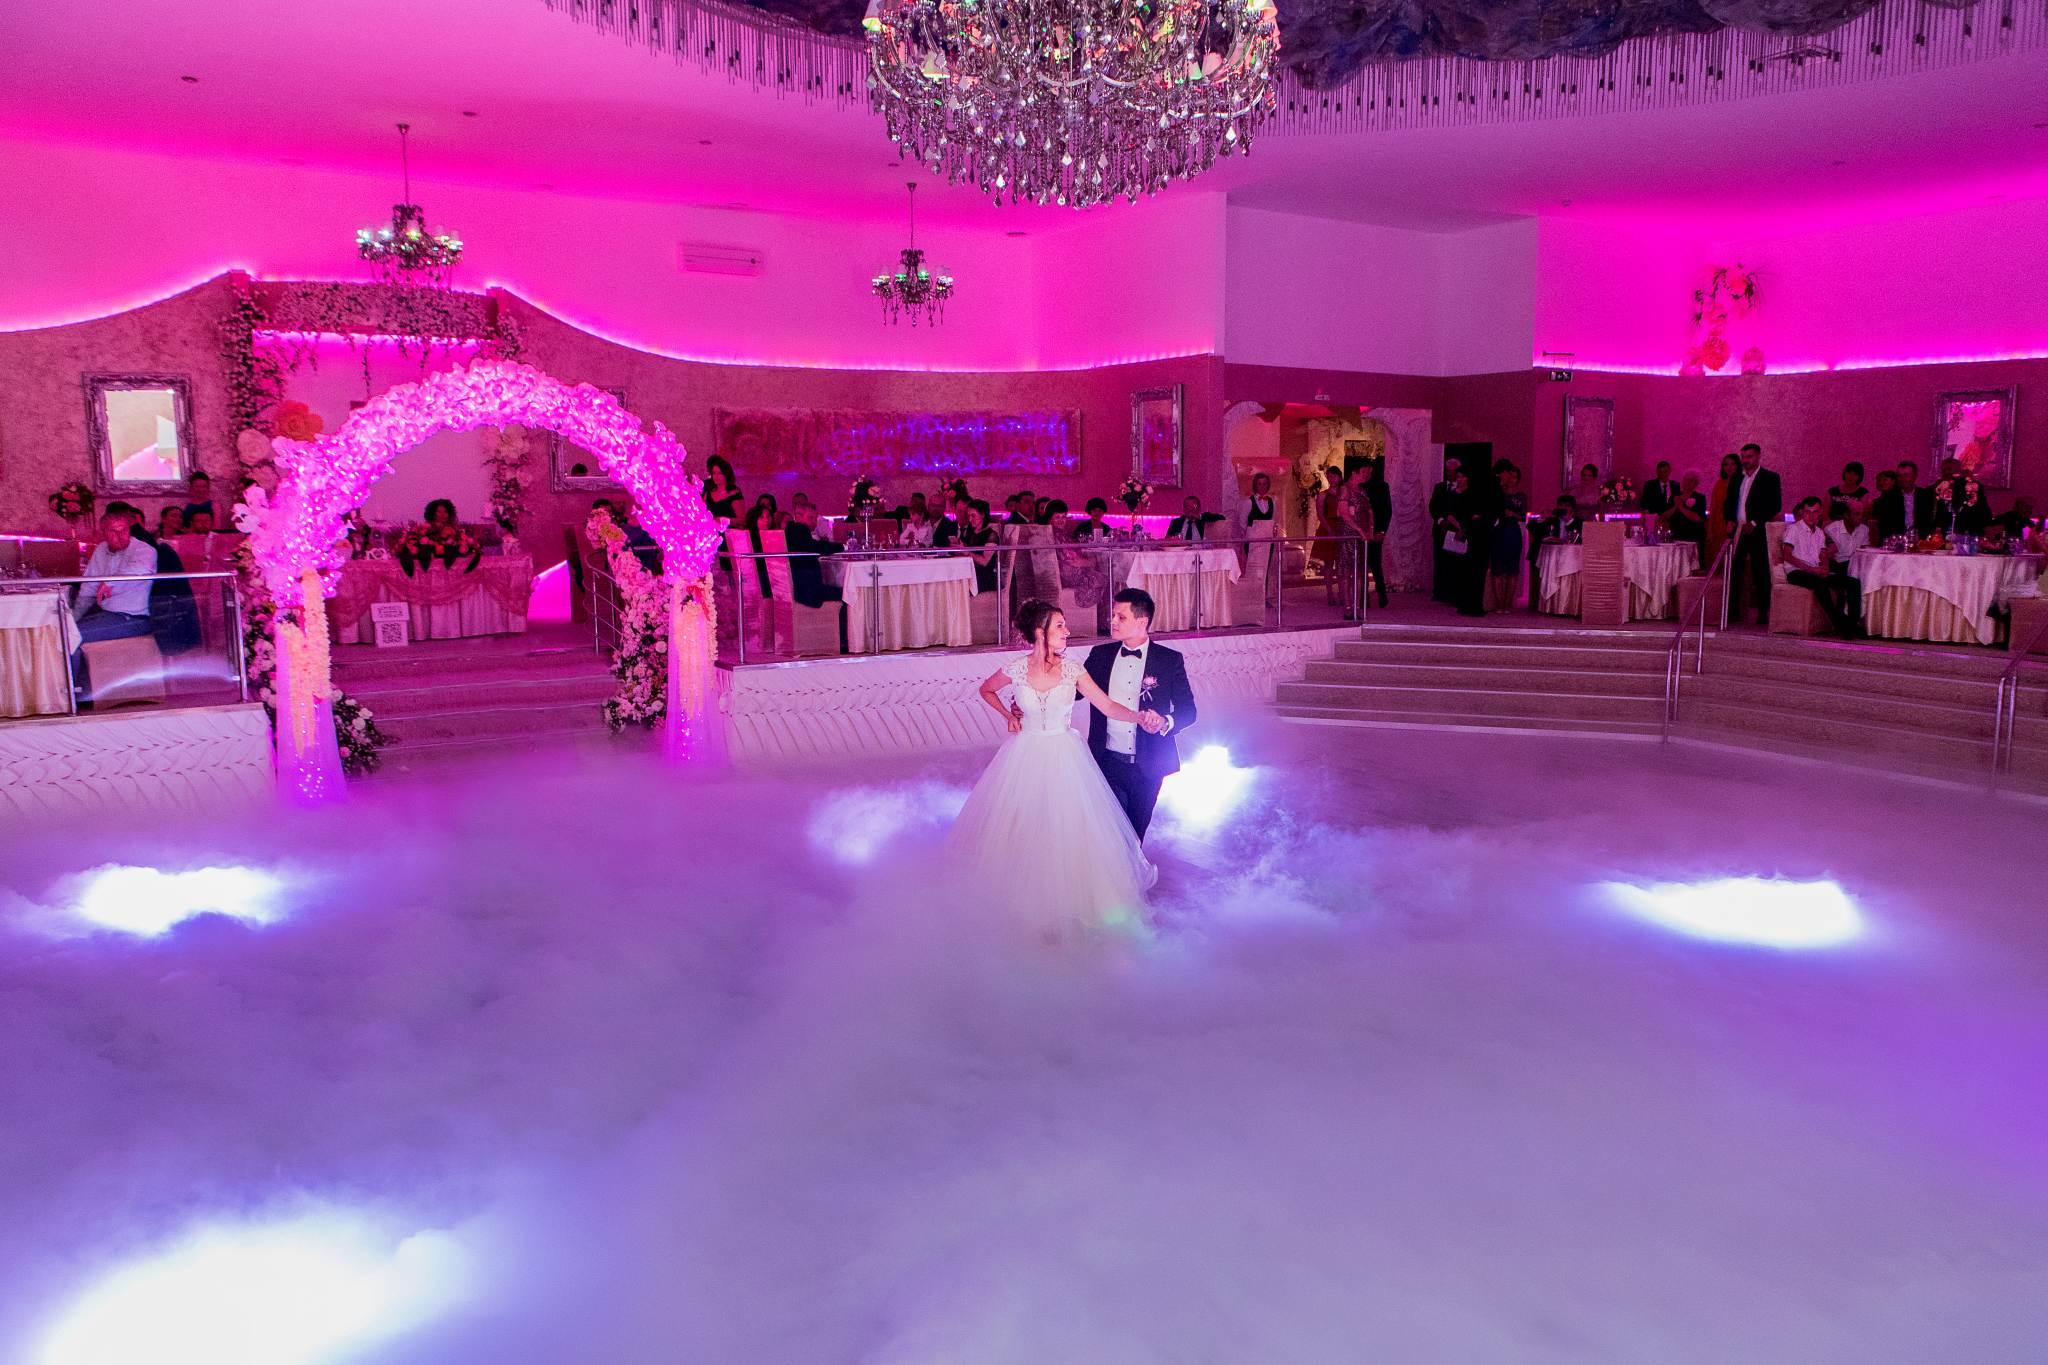 fotografii-nunta-cristina-si-sorin60.jpg